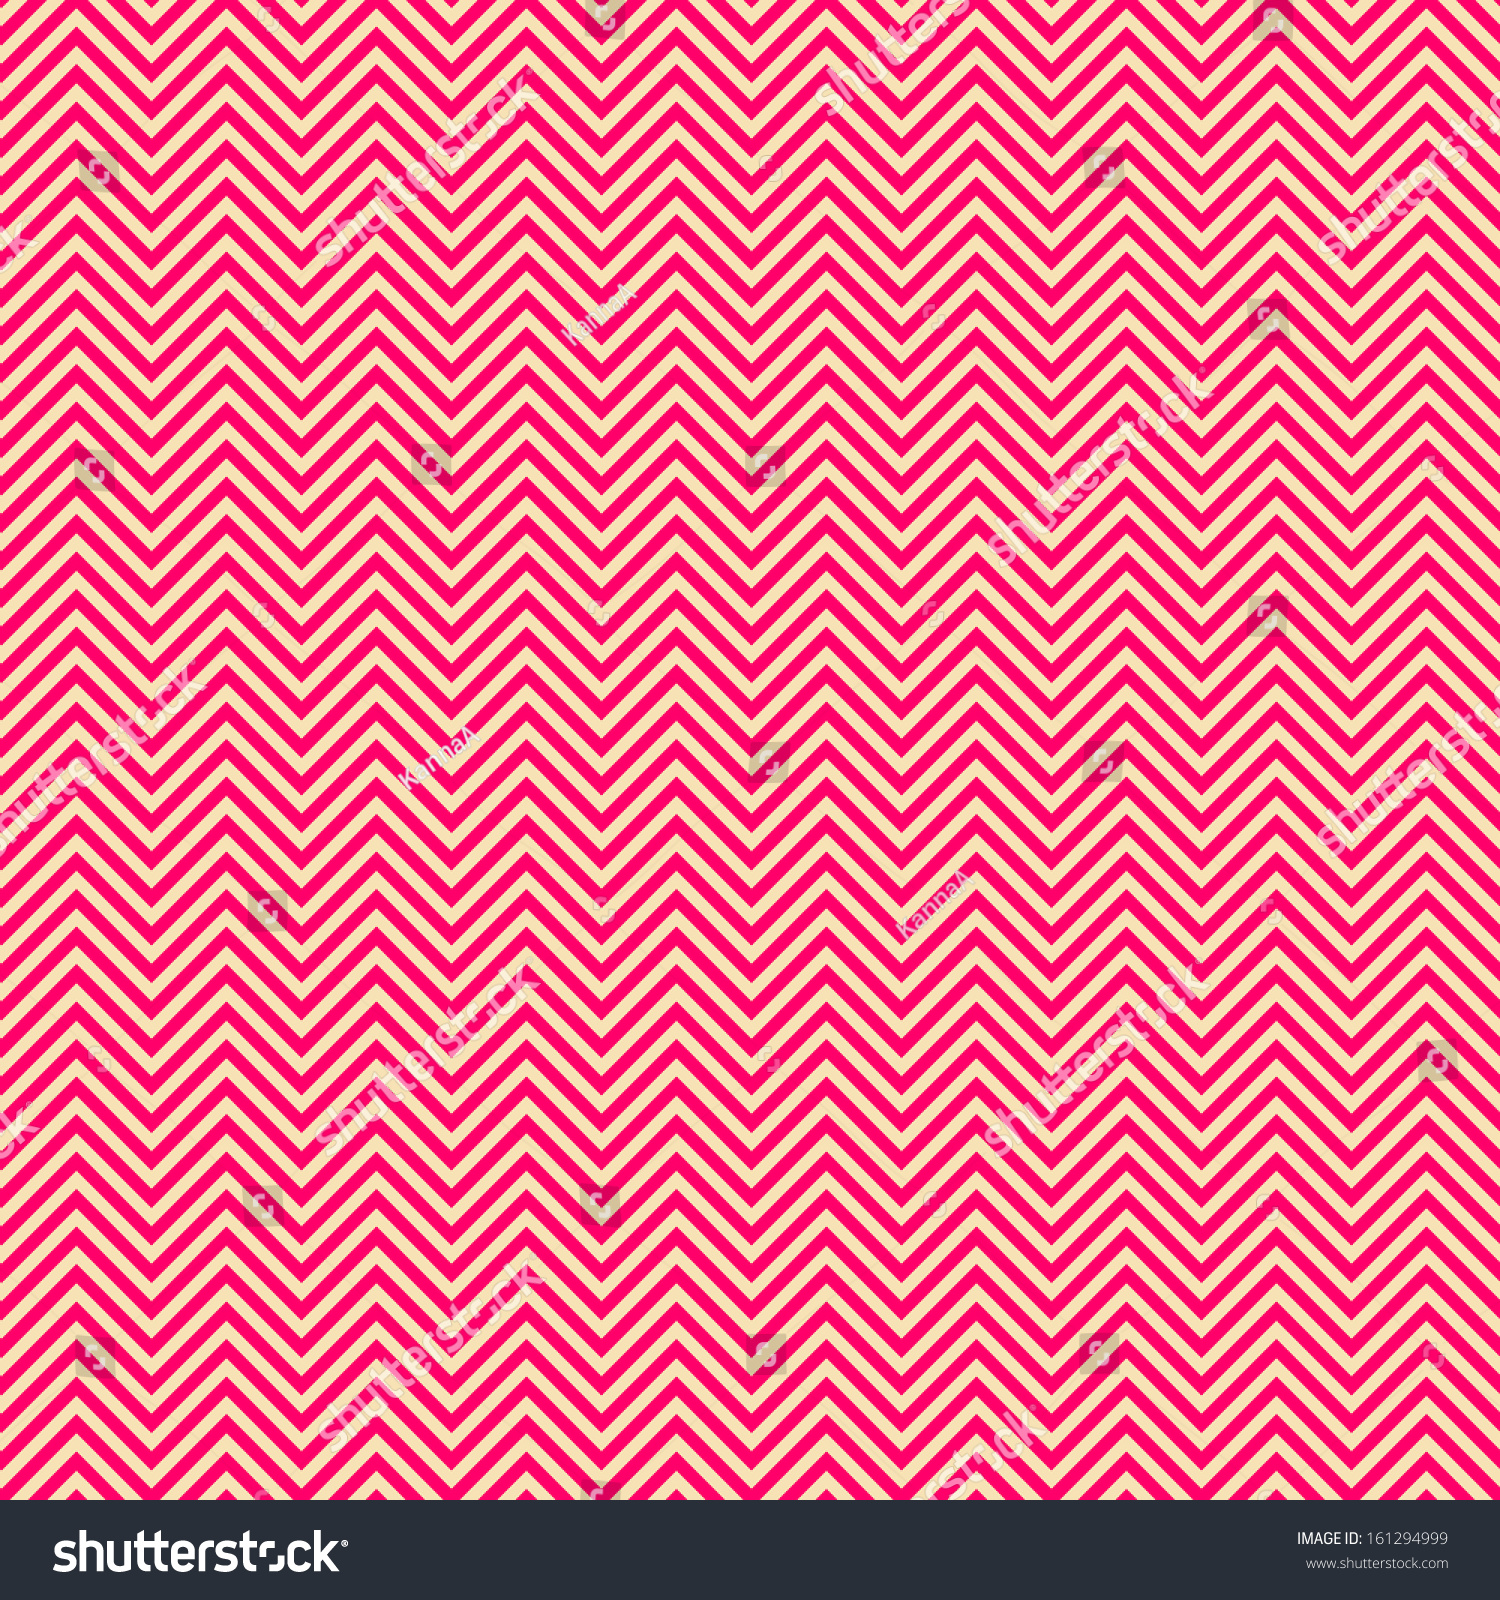 pink vagina vidieos